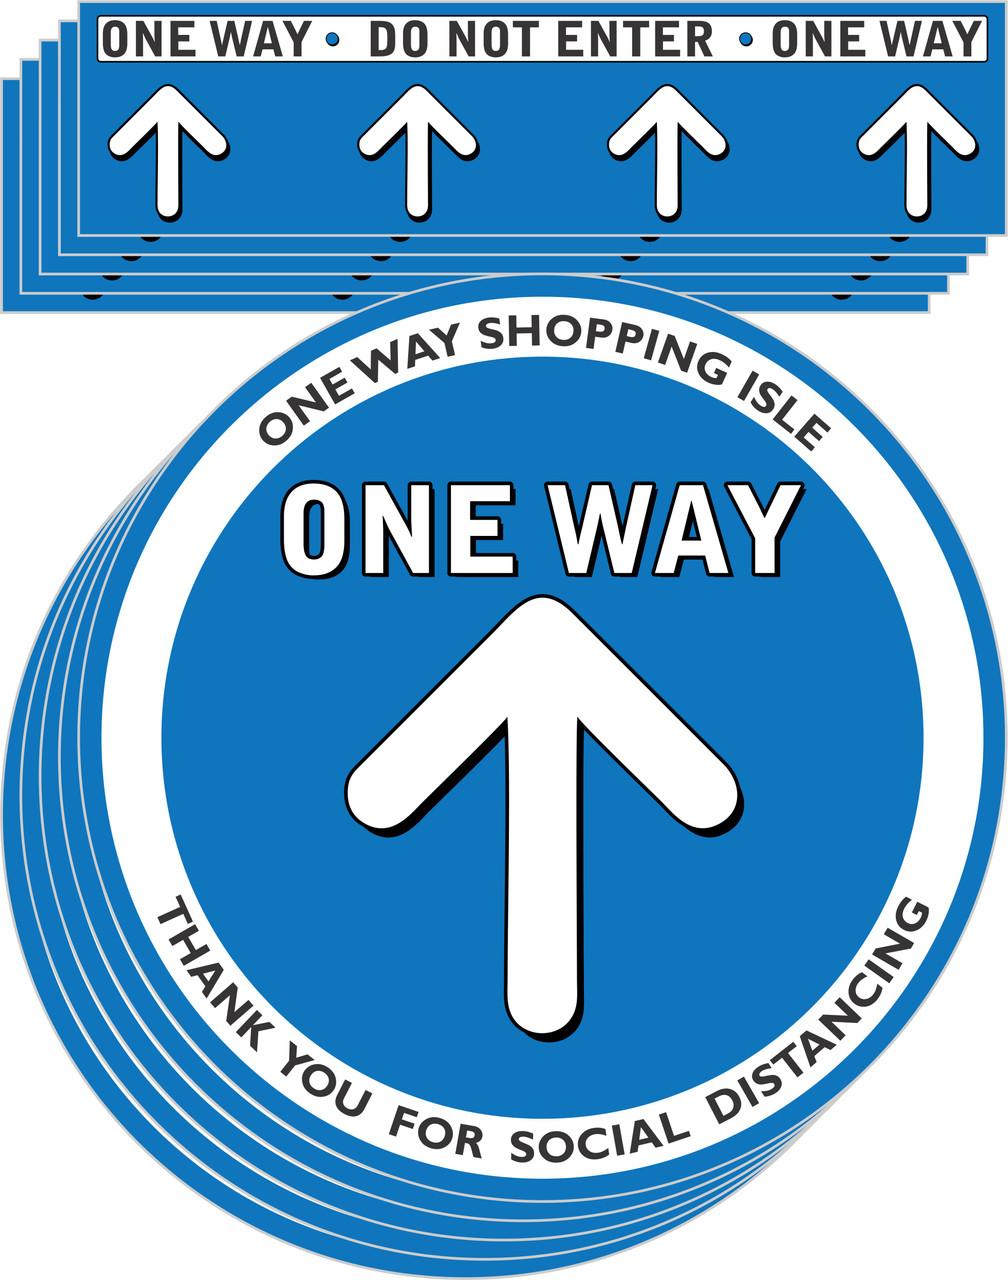 One way Aisle Social Distancing Floor Decal | Covid-19 Floor Sticker | Coronavirus Floor Decal | Social Distancing Floor Sign | Pandemic Floor Sticker | Do Not Enter Floor Sticker 5 pack